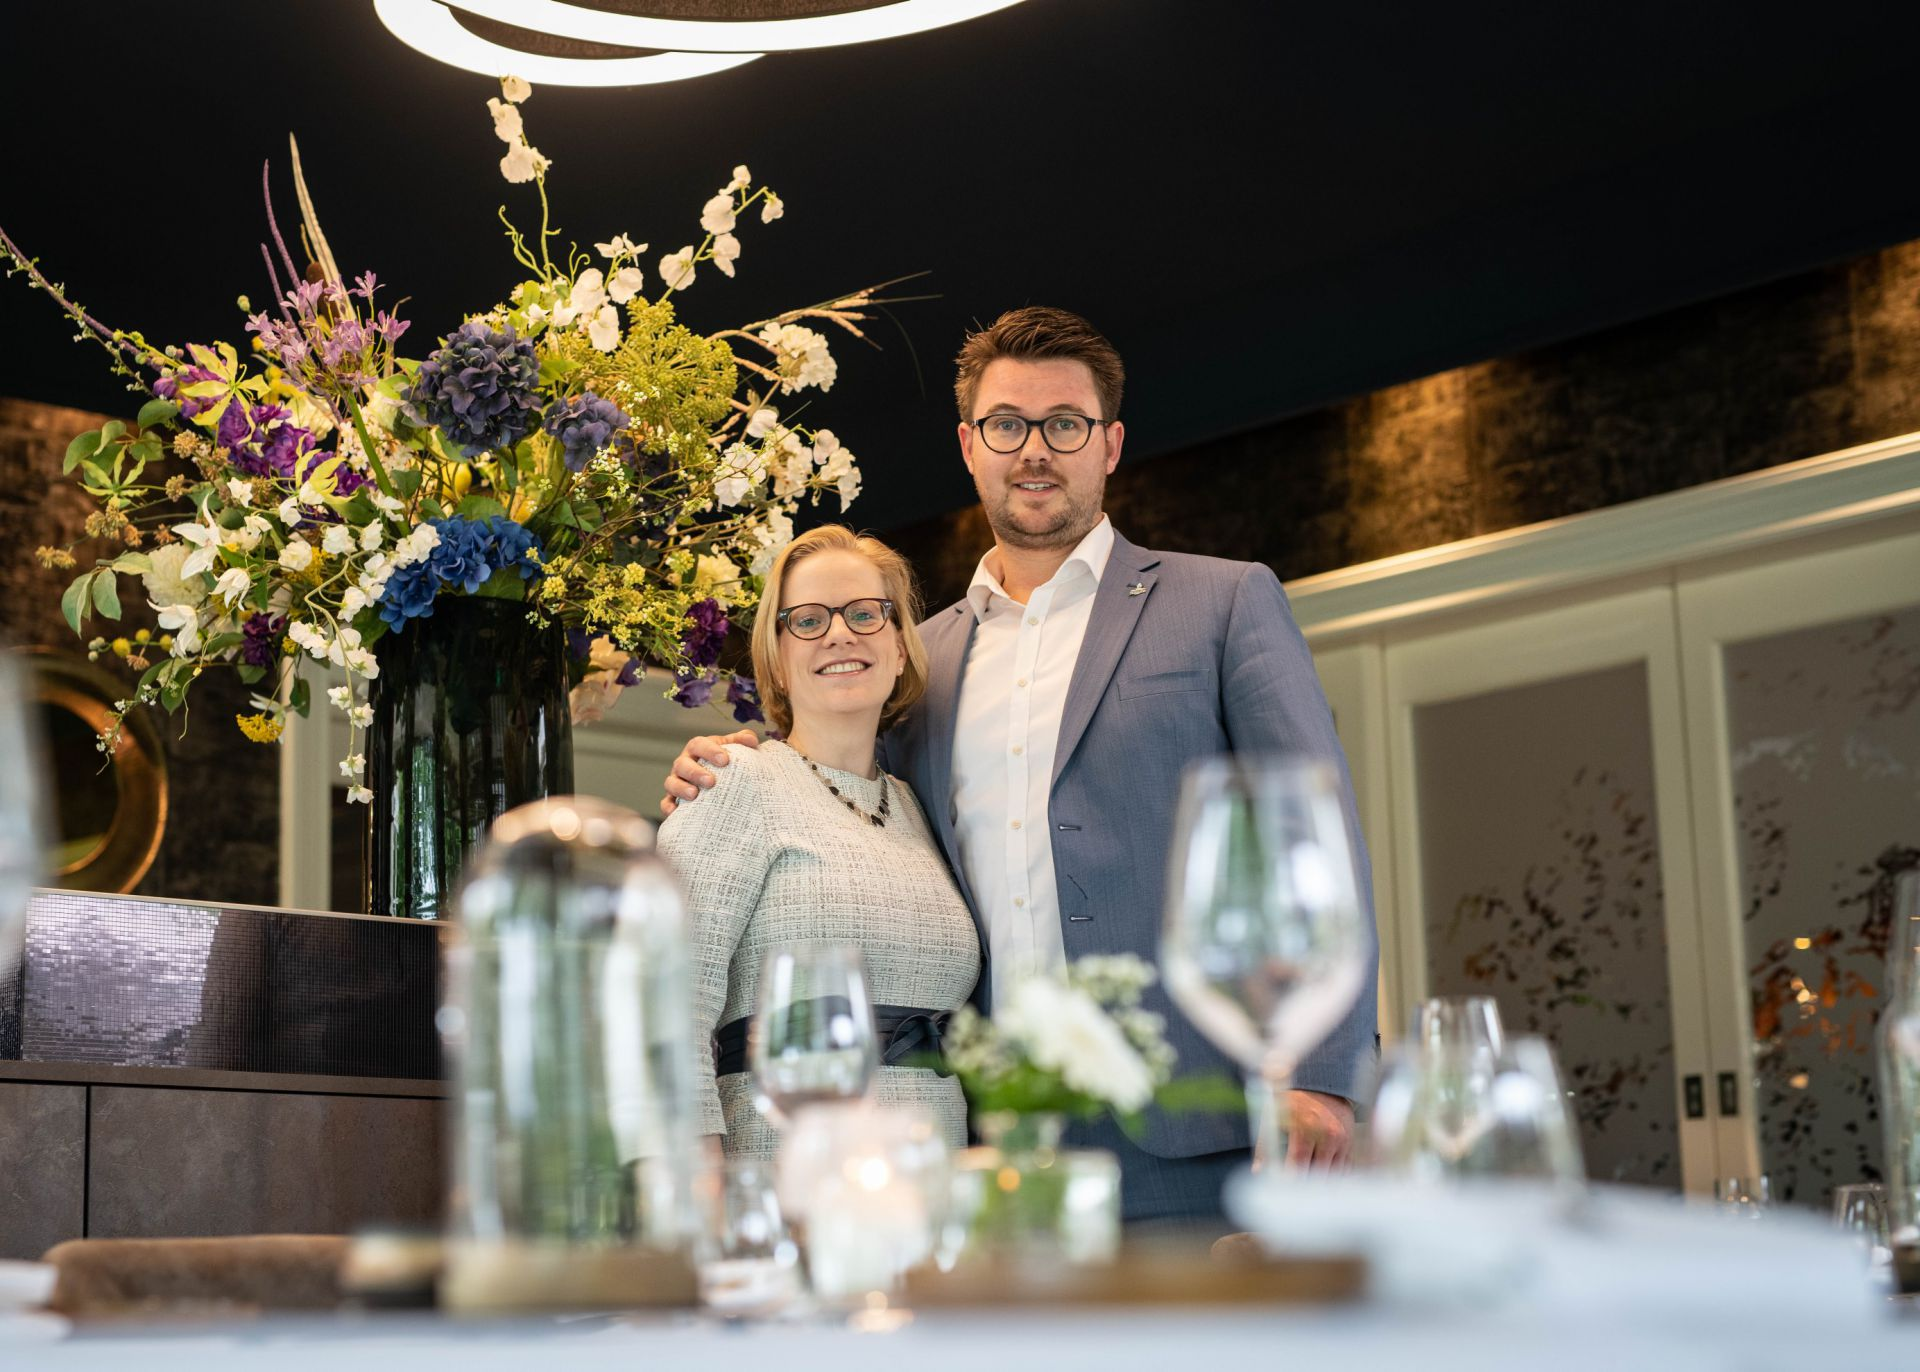 Carelshaven Delden toegetreden tot JRE-Nederland en QL Hotels & Restaurants